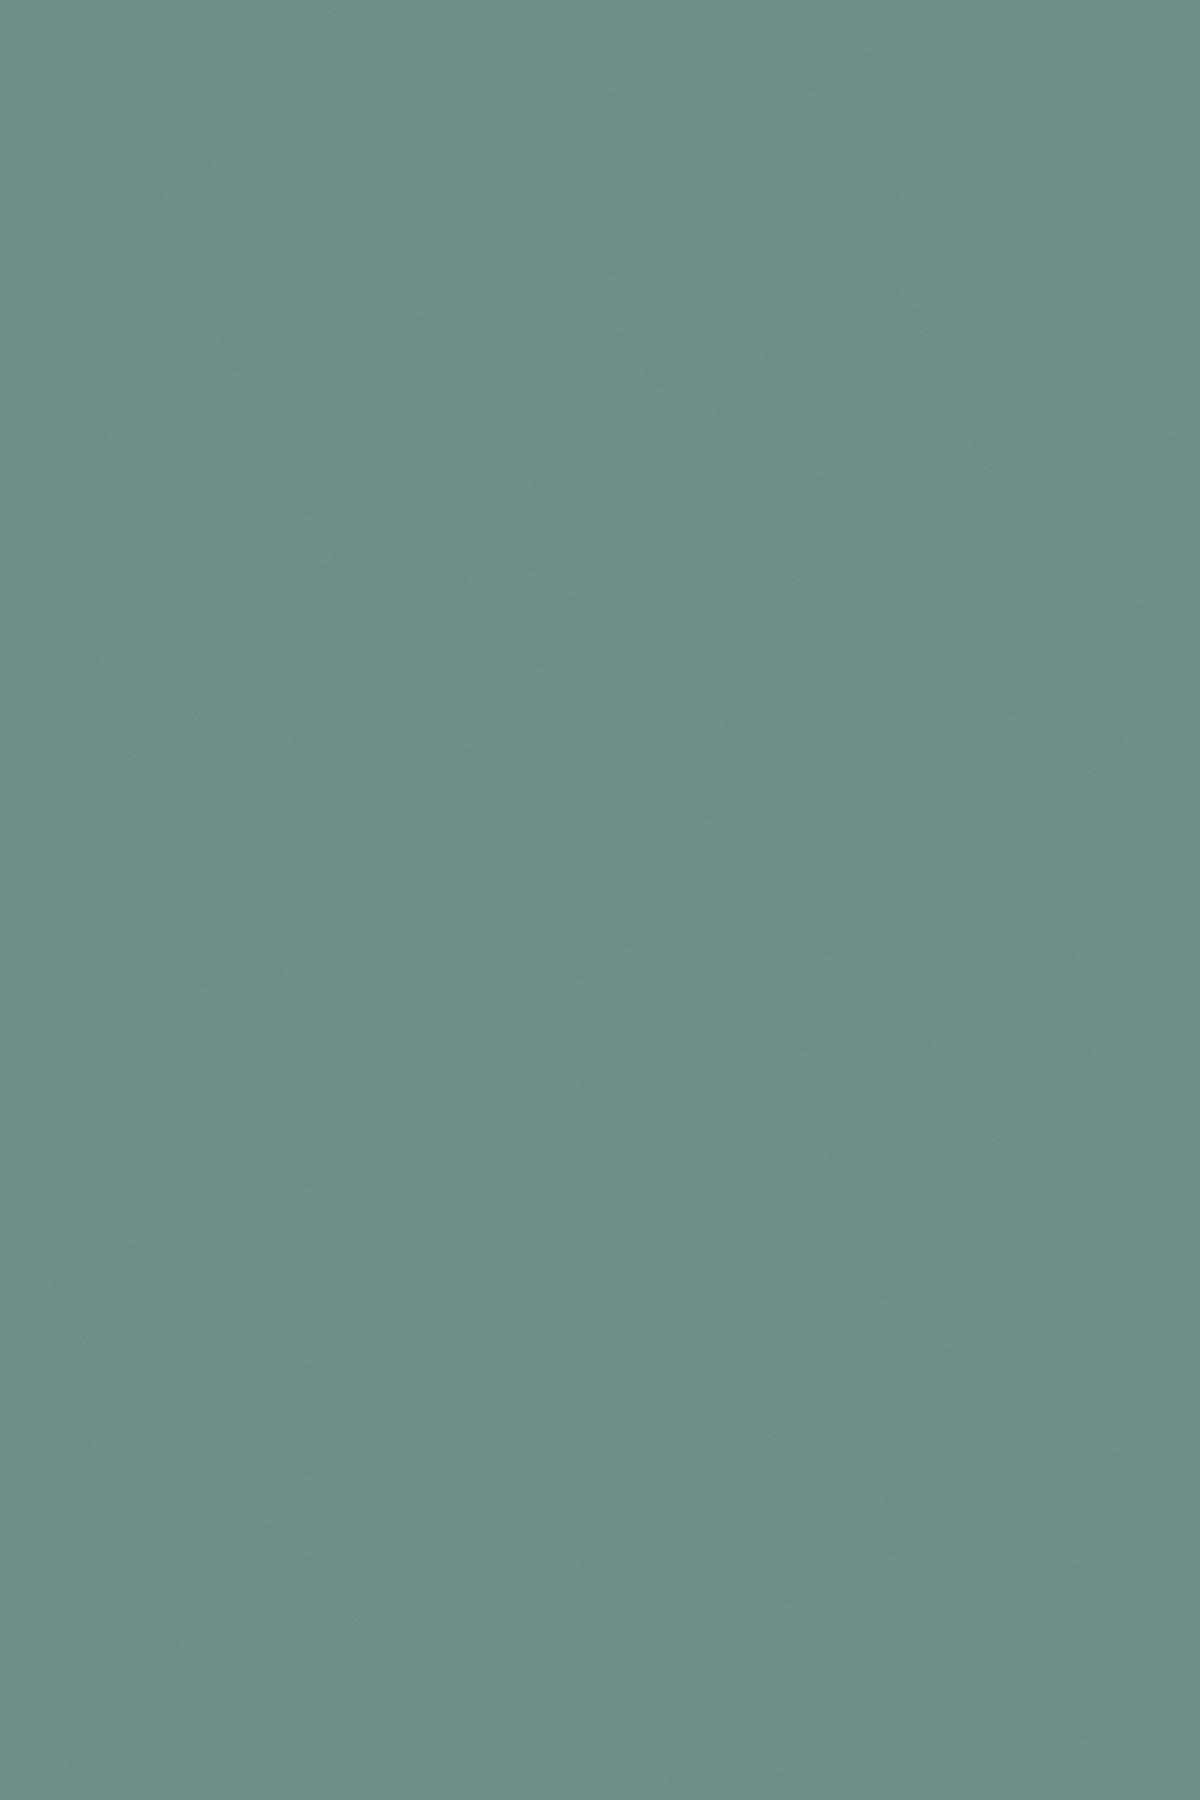 K097SU;BS Сумеречный Голубой